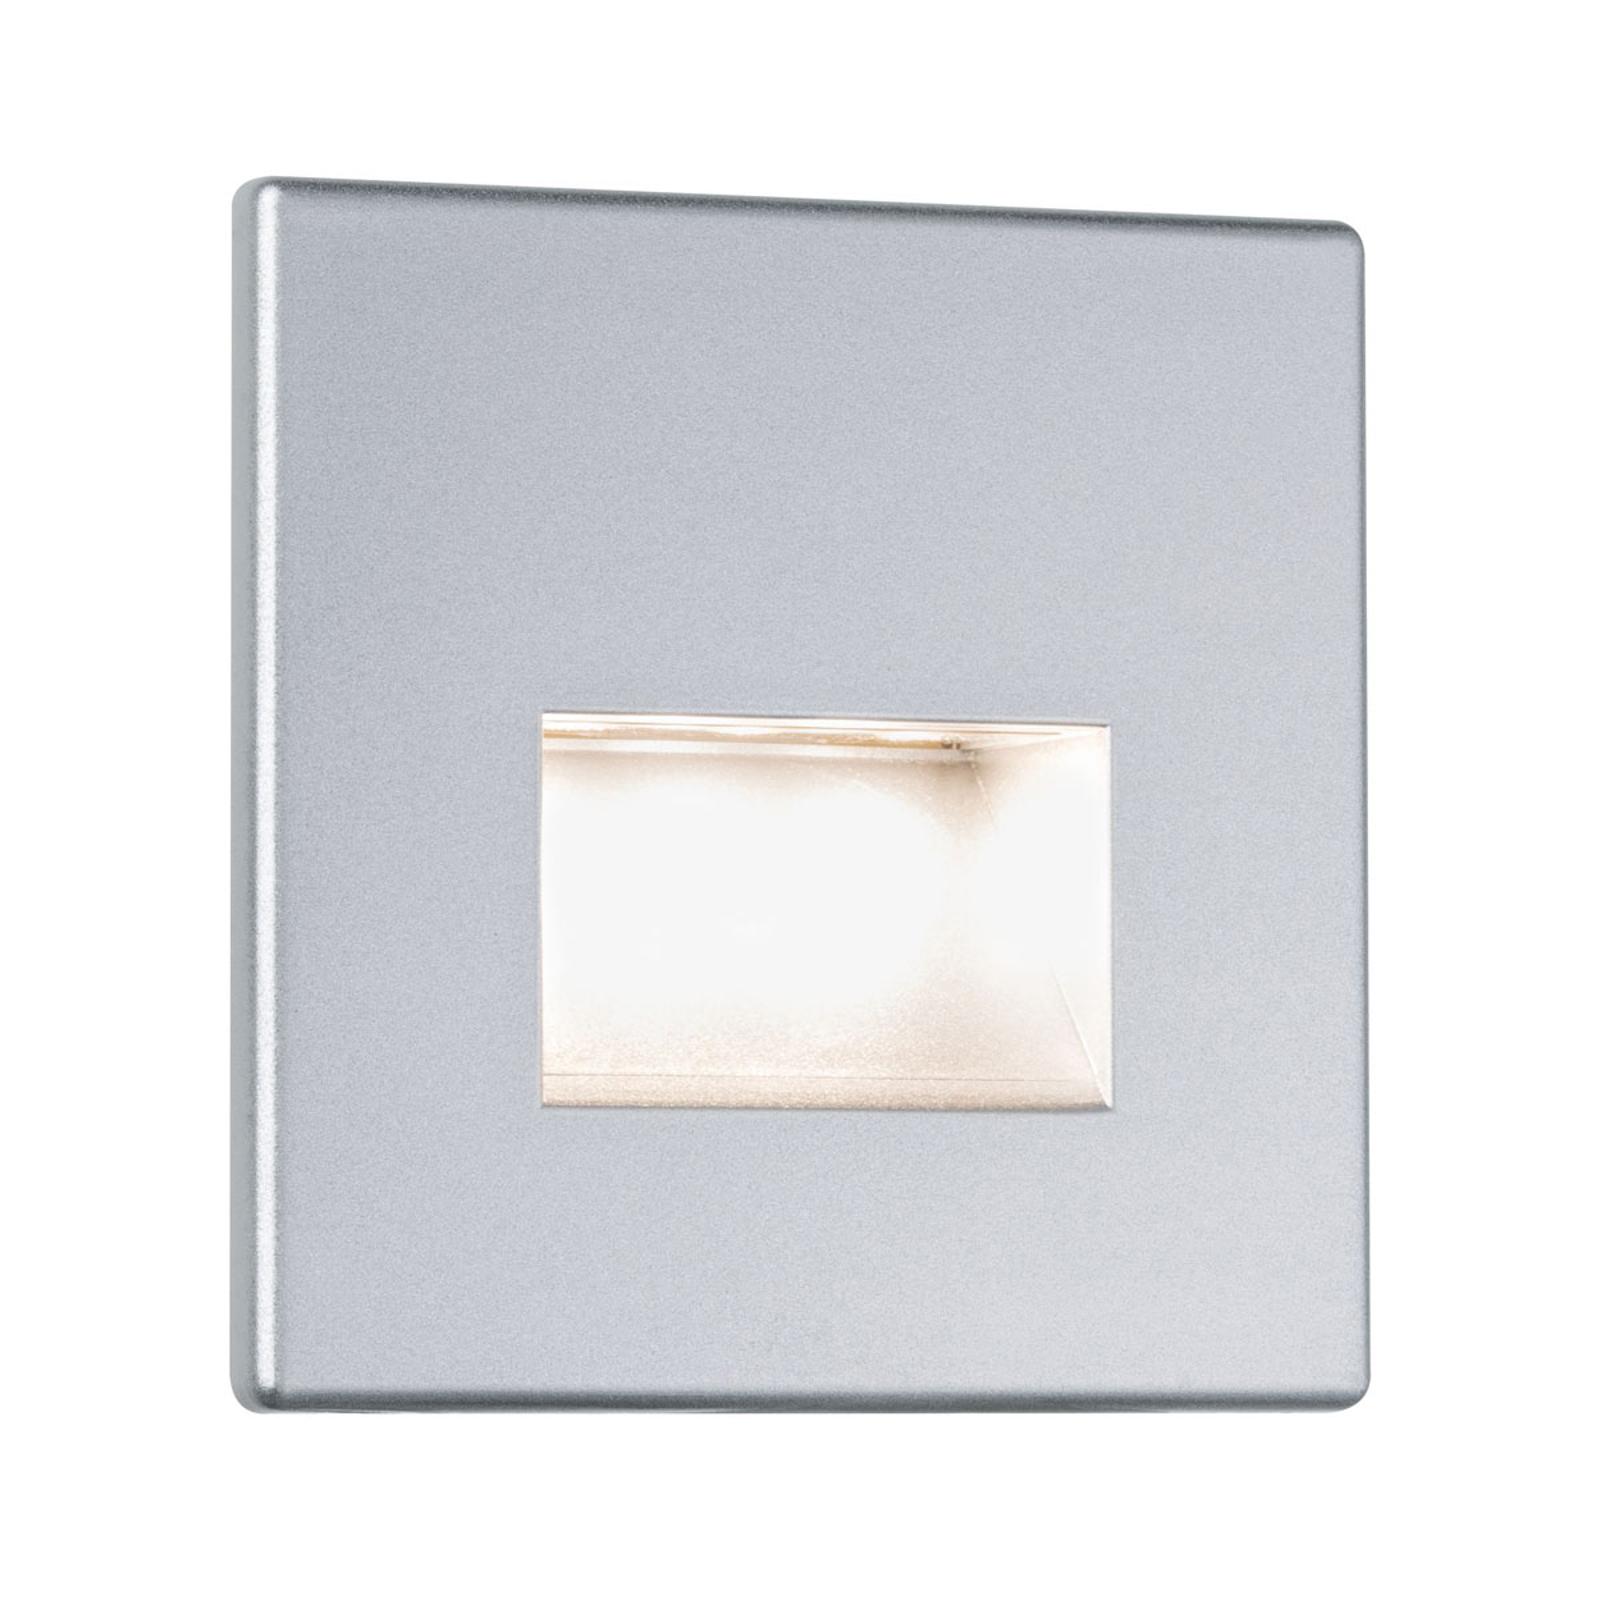 Paulmann LED-Wandeinbauleuchte Edge, chrom matt